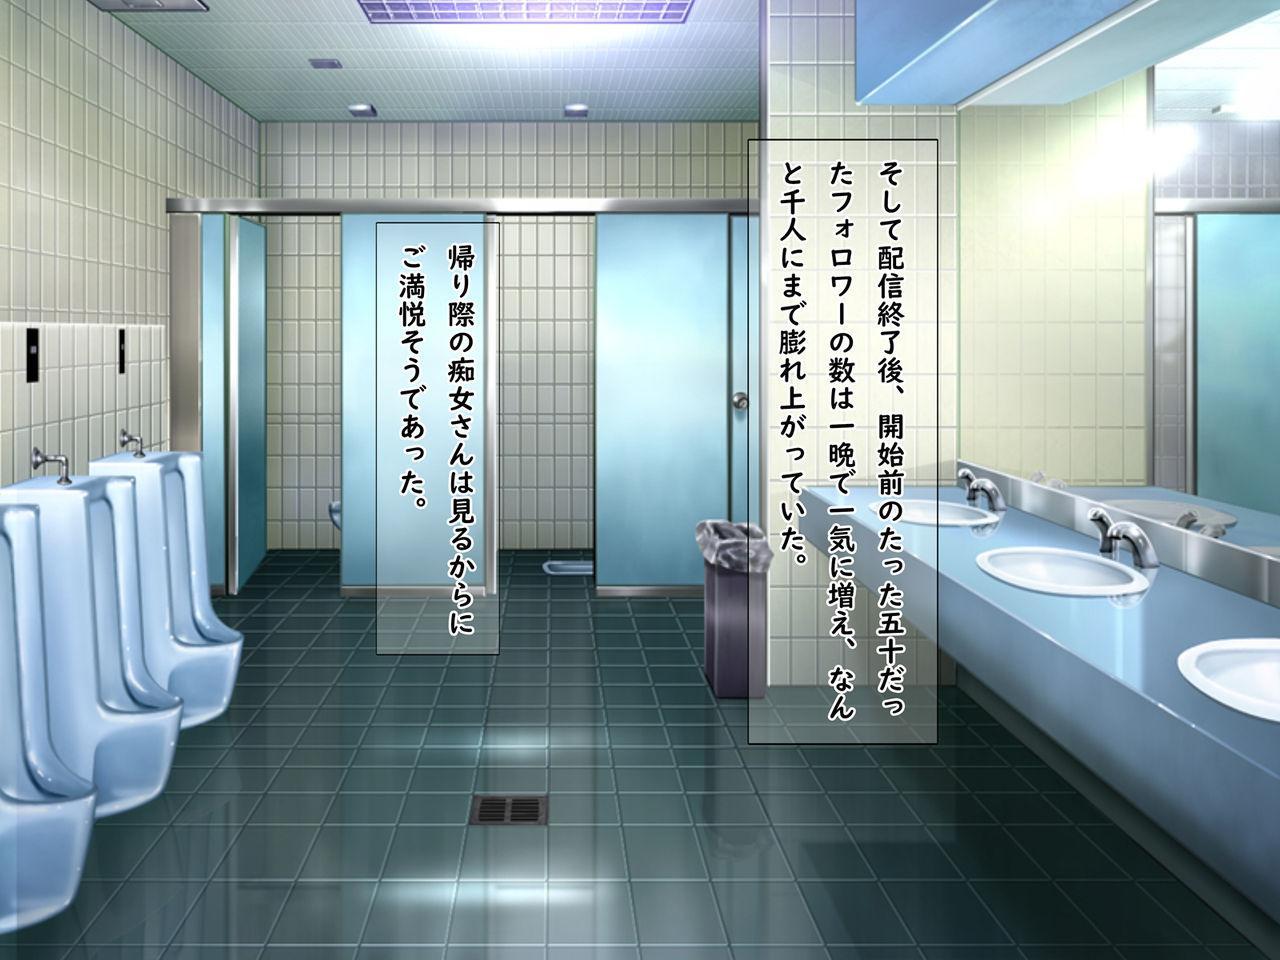 [Fujimiya Yahiro] Bakunyuu Chijo-san to Kokute Mijikai Go-kakan 203